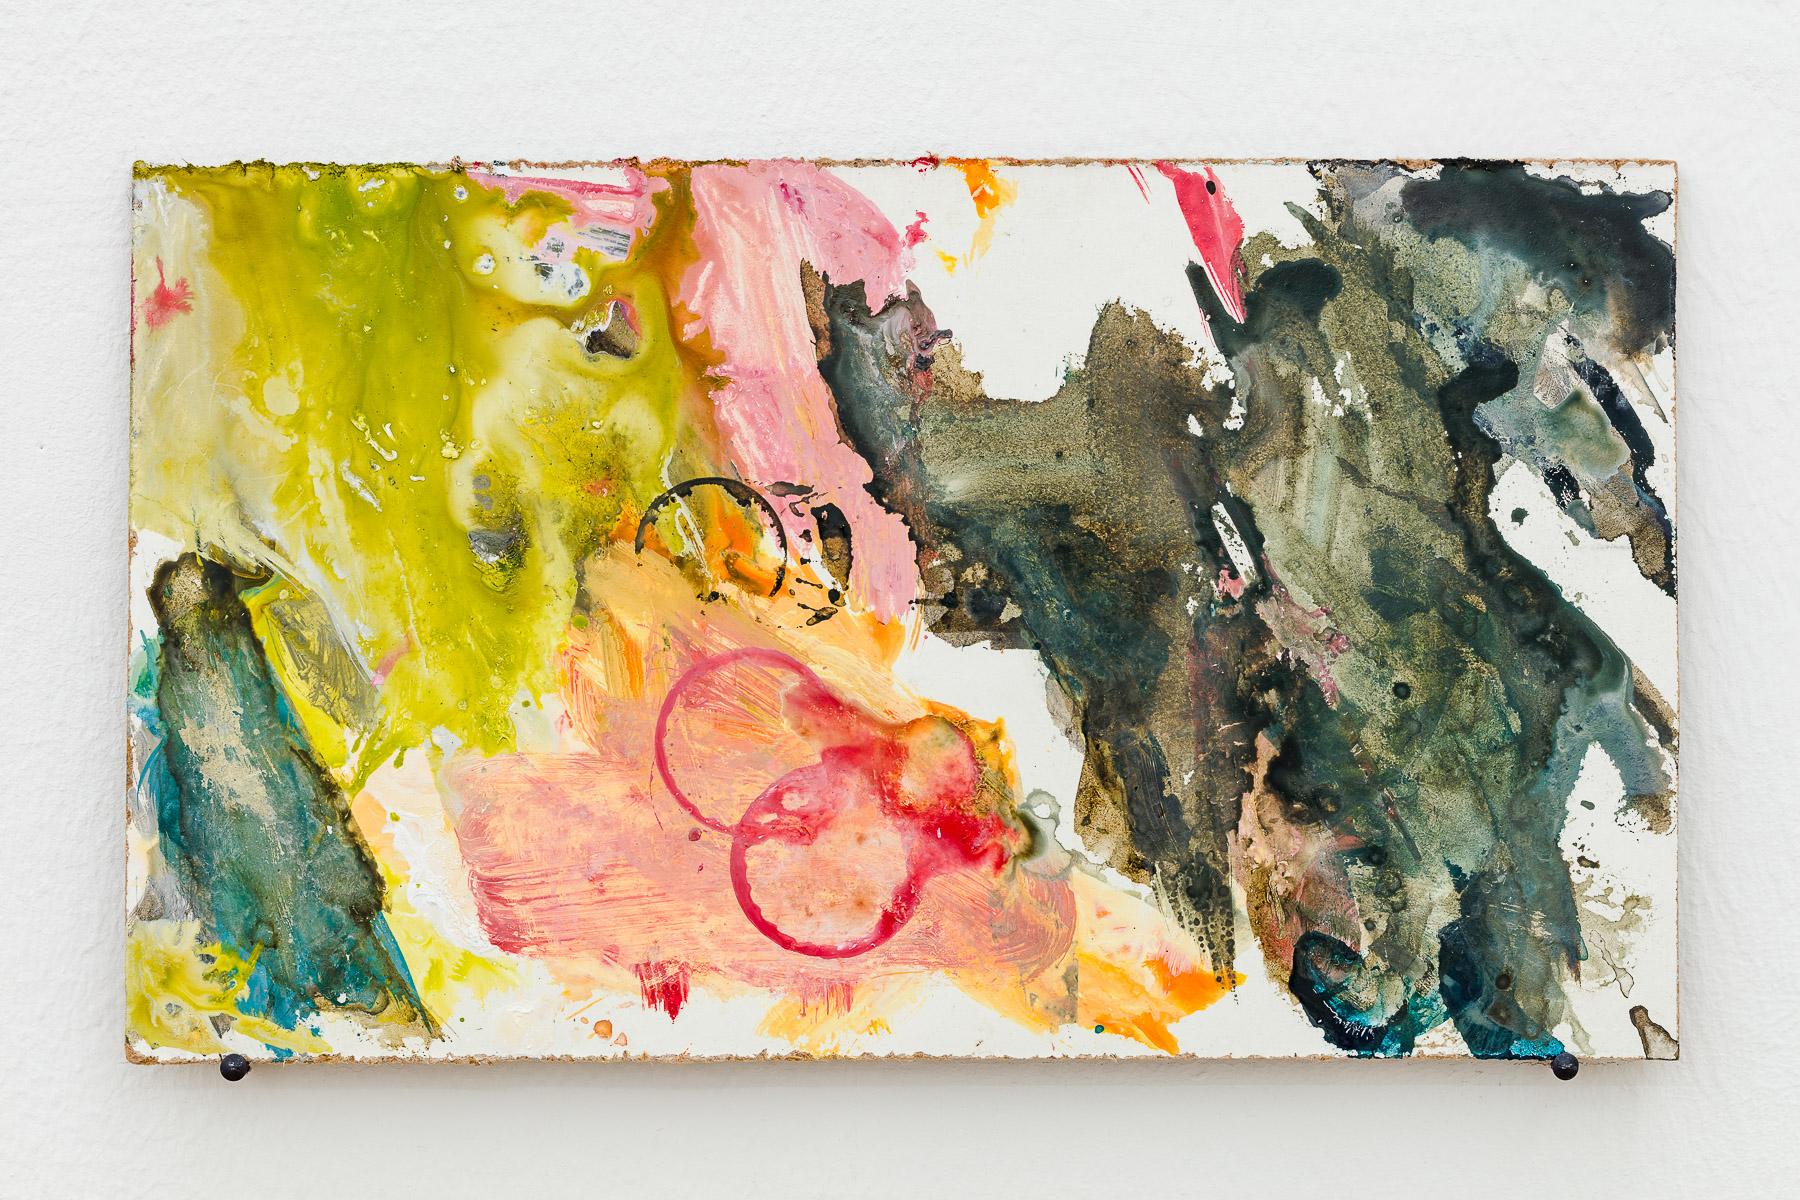 2019_05_20_Elke-Krystufek_Croy-Nielsen_by-kunst-dokumentation-com_006_web.jpg